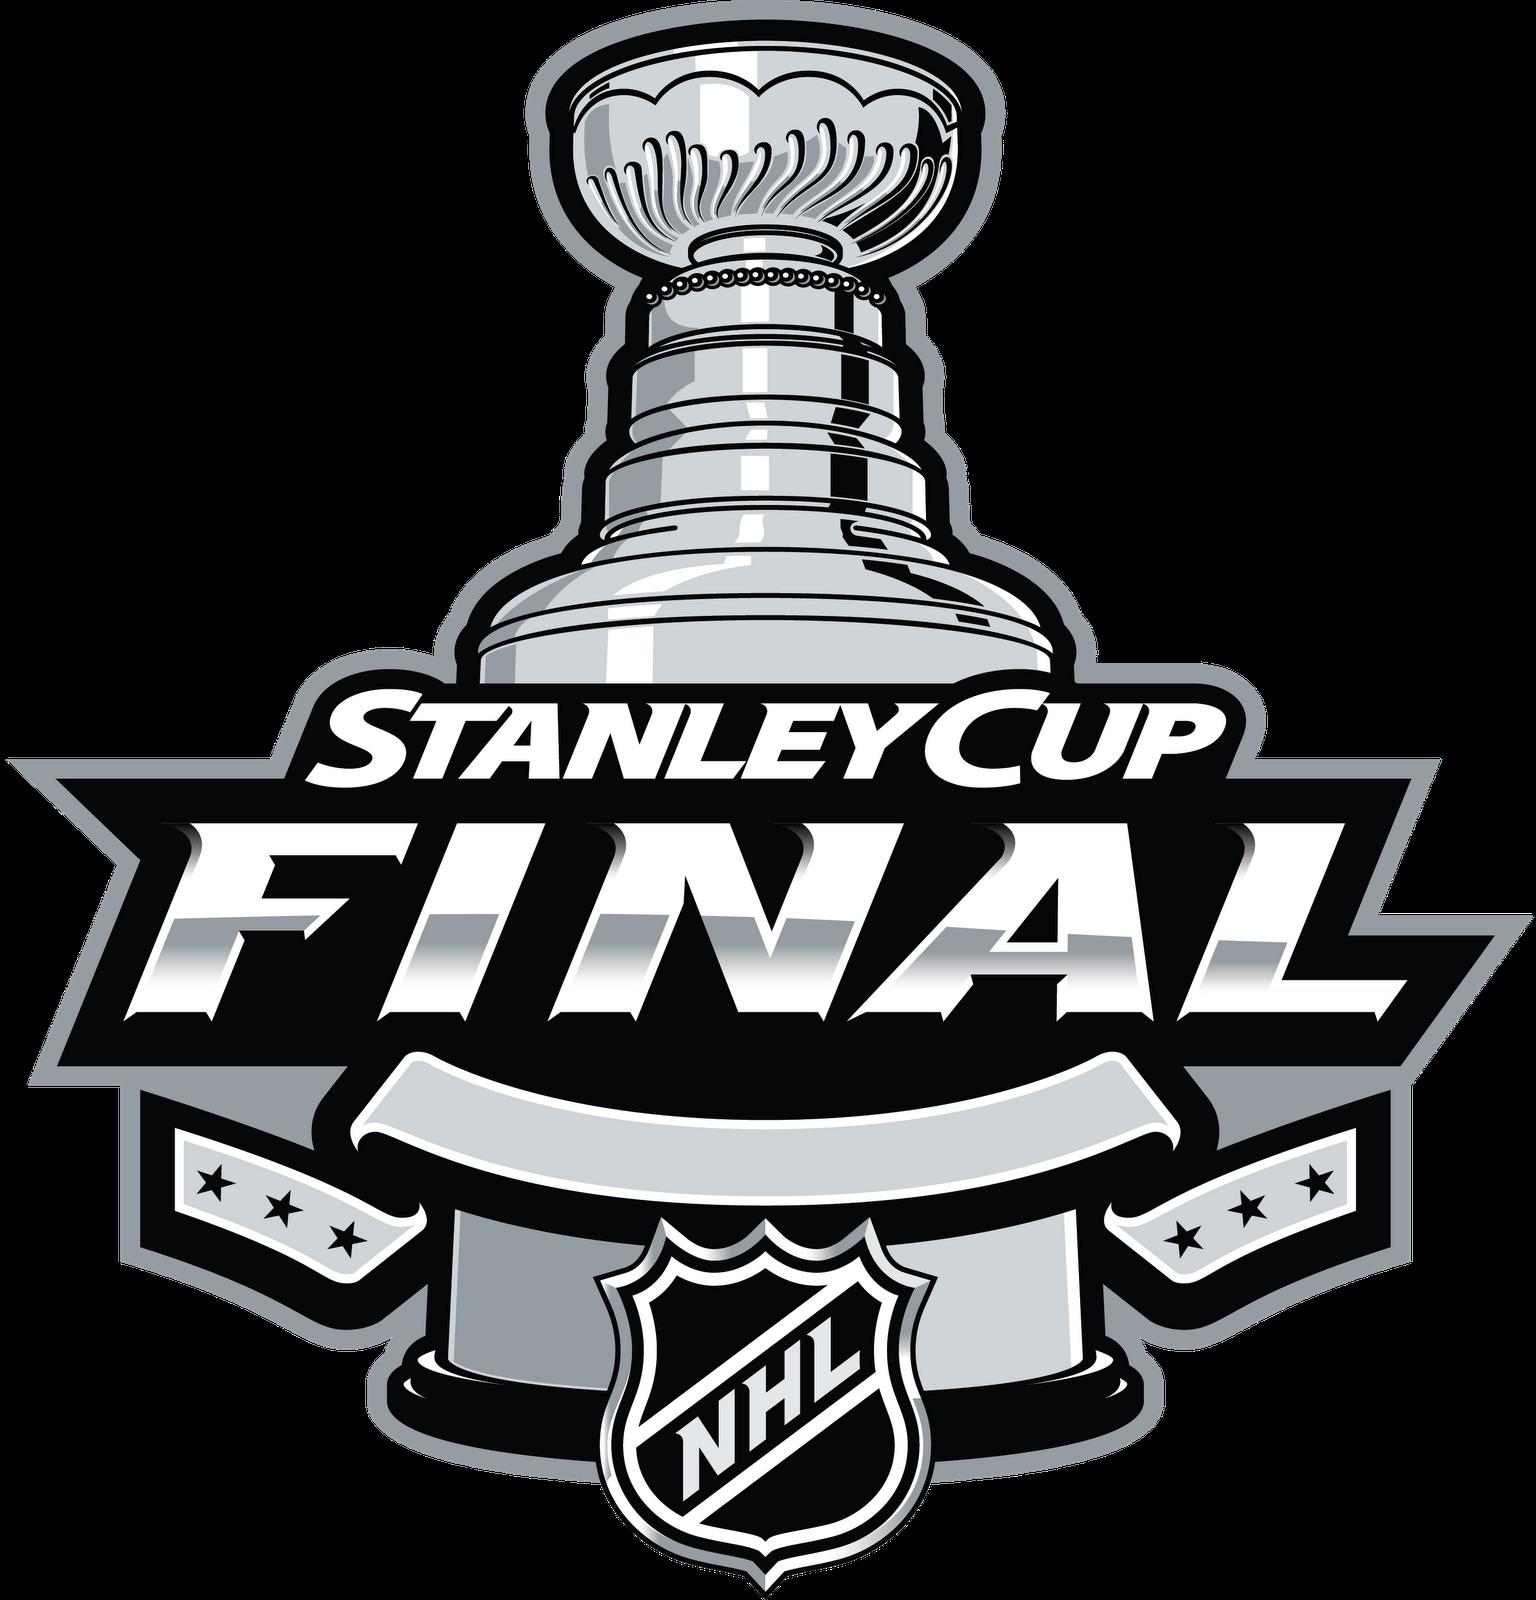 clip art stanley cup - photo #30